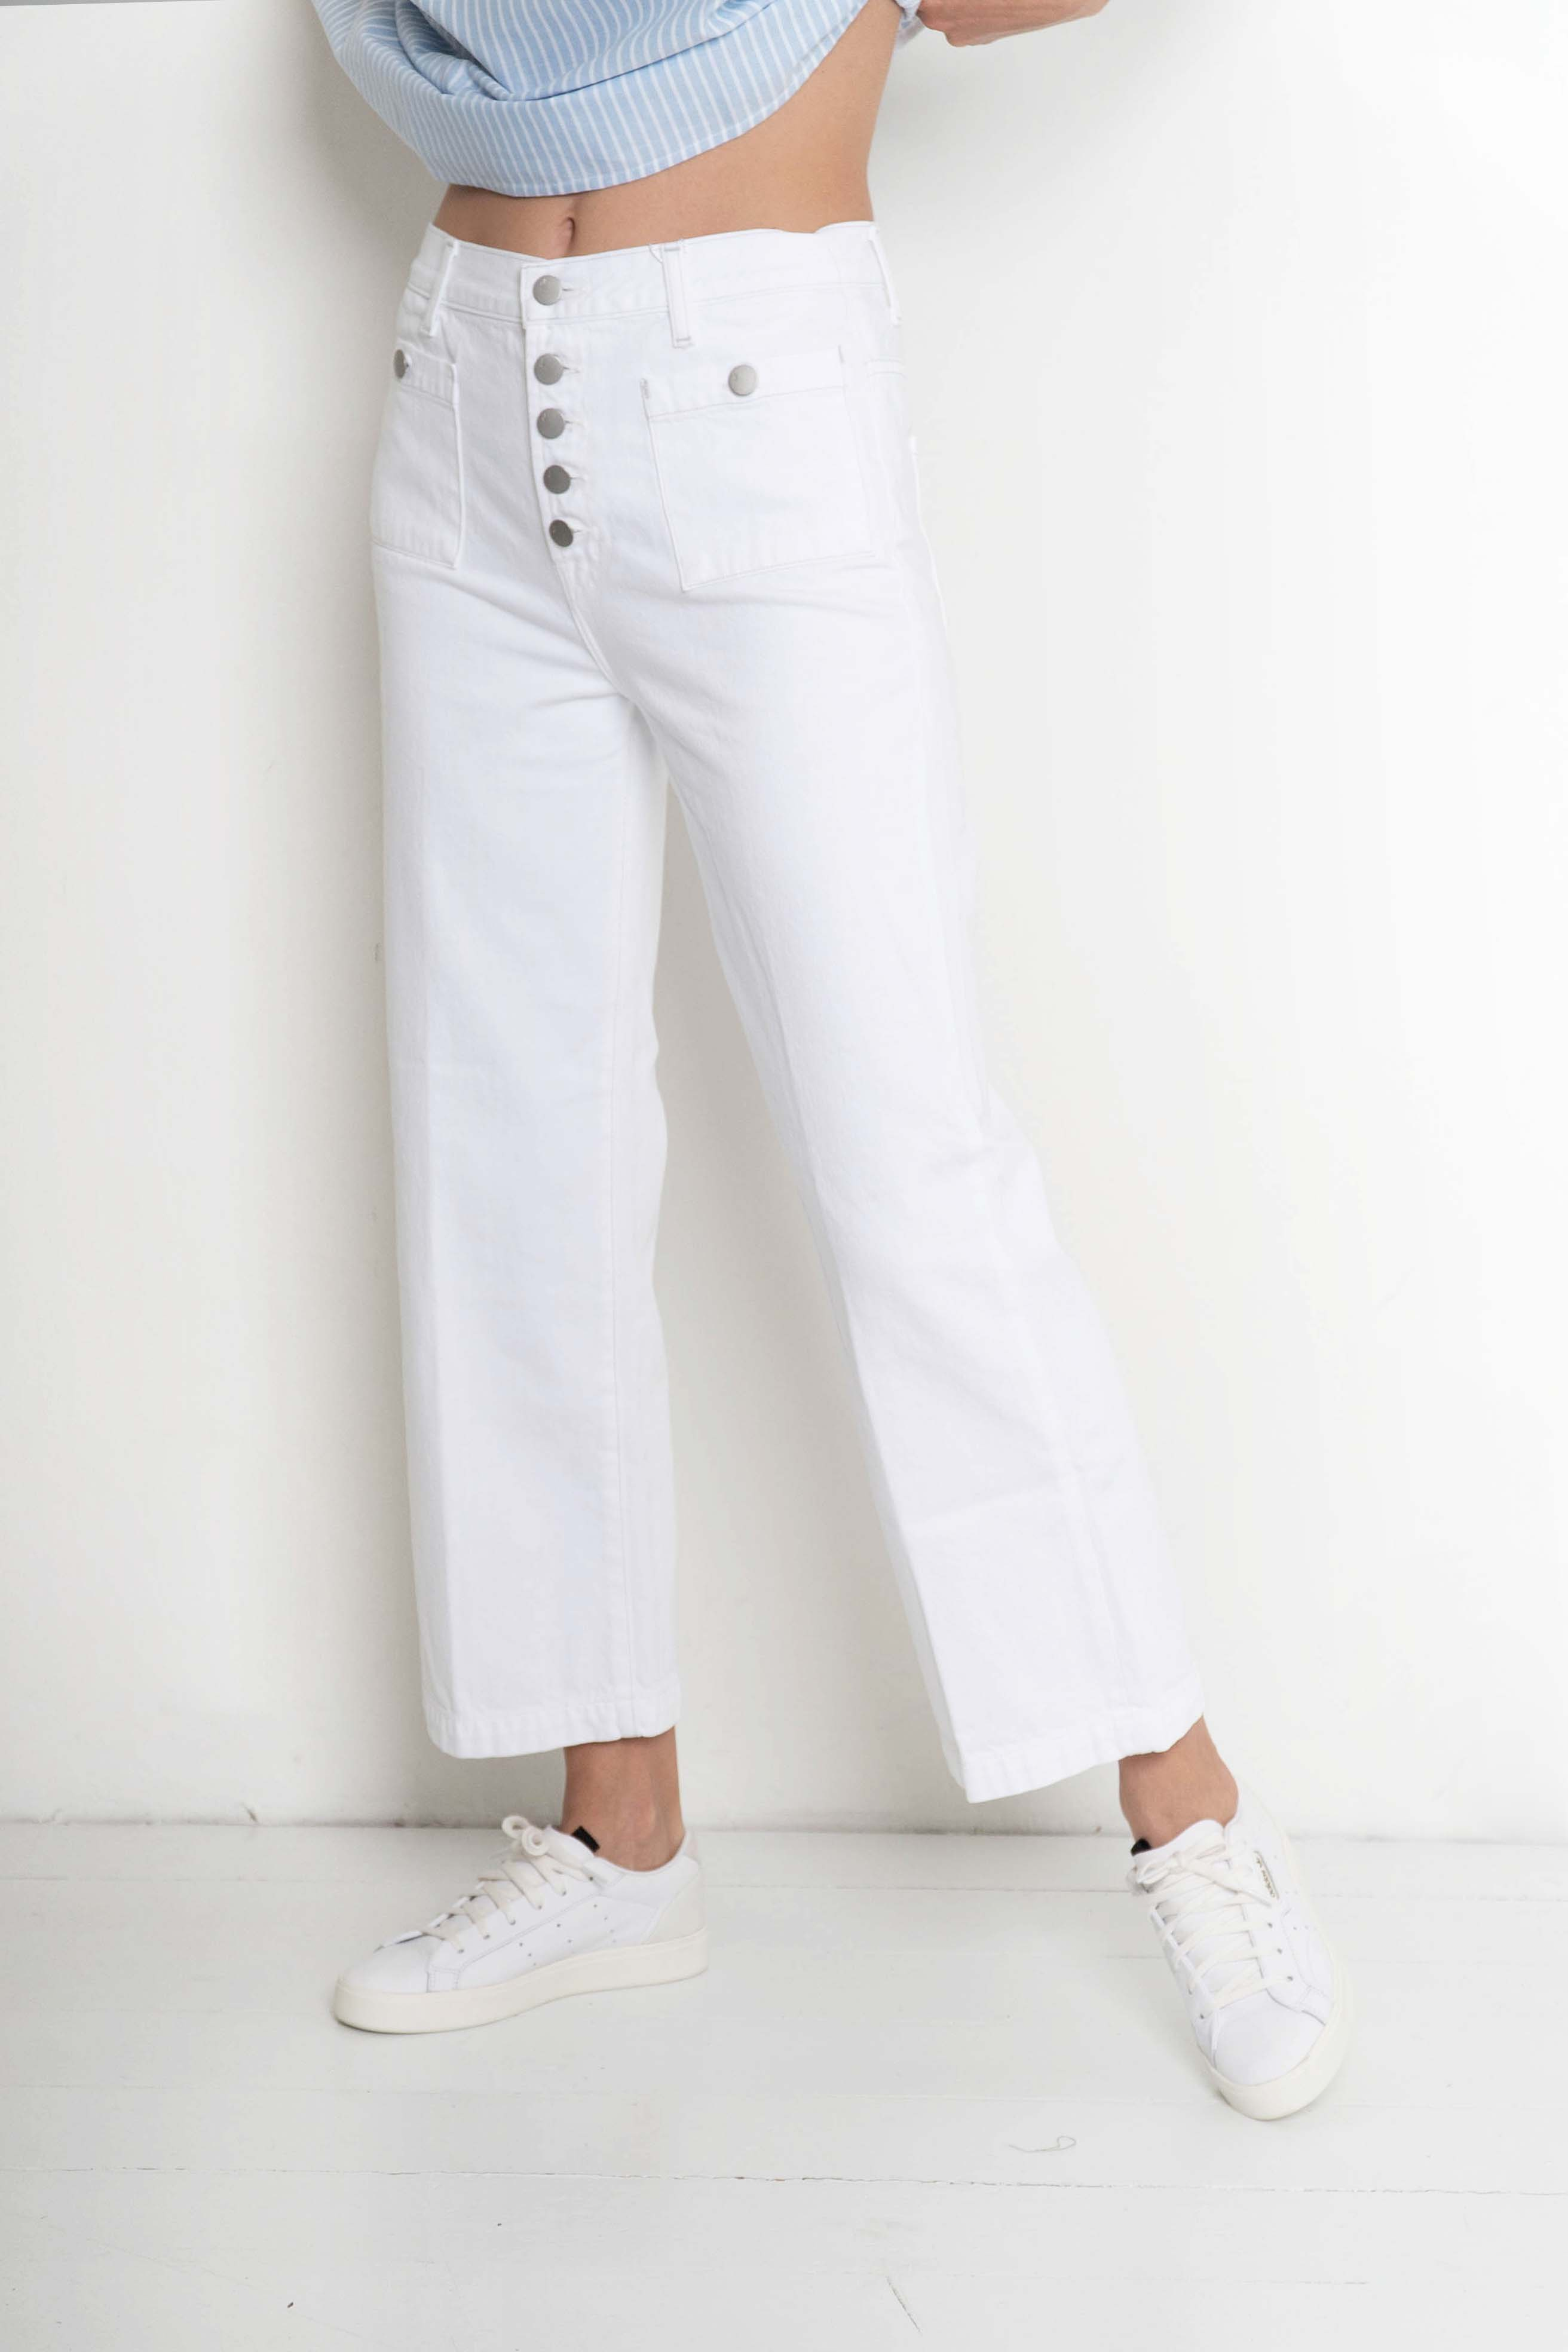 jeans blancos jbrand barcelona